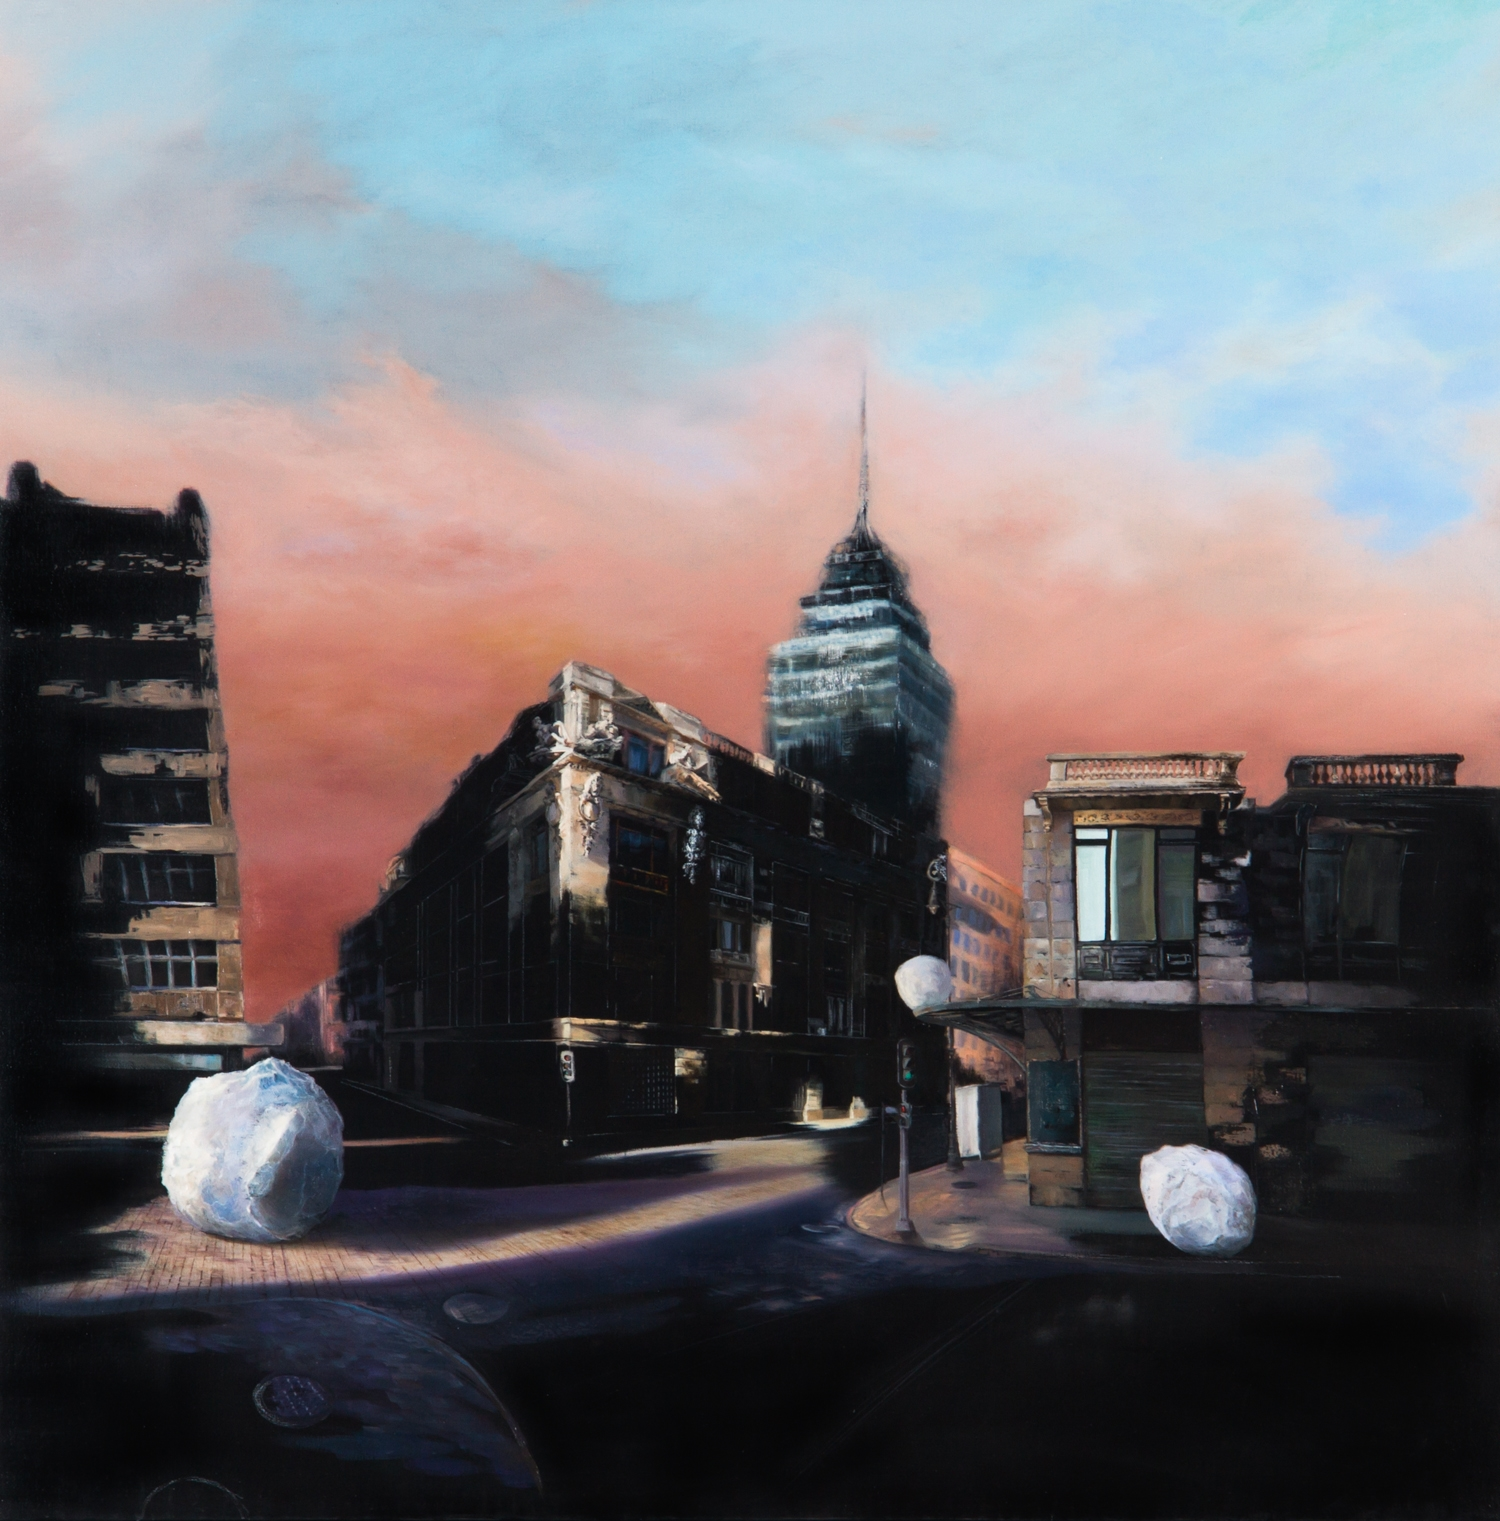 Mañana Desaparece ,Óleo sobre tela,150 x 150 cm,2010    Tomorrow Disappears ,  Oil on canvas,4' 11'' x 4' 11'',2010